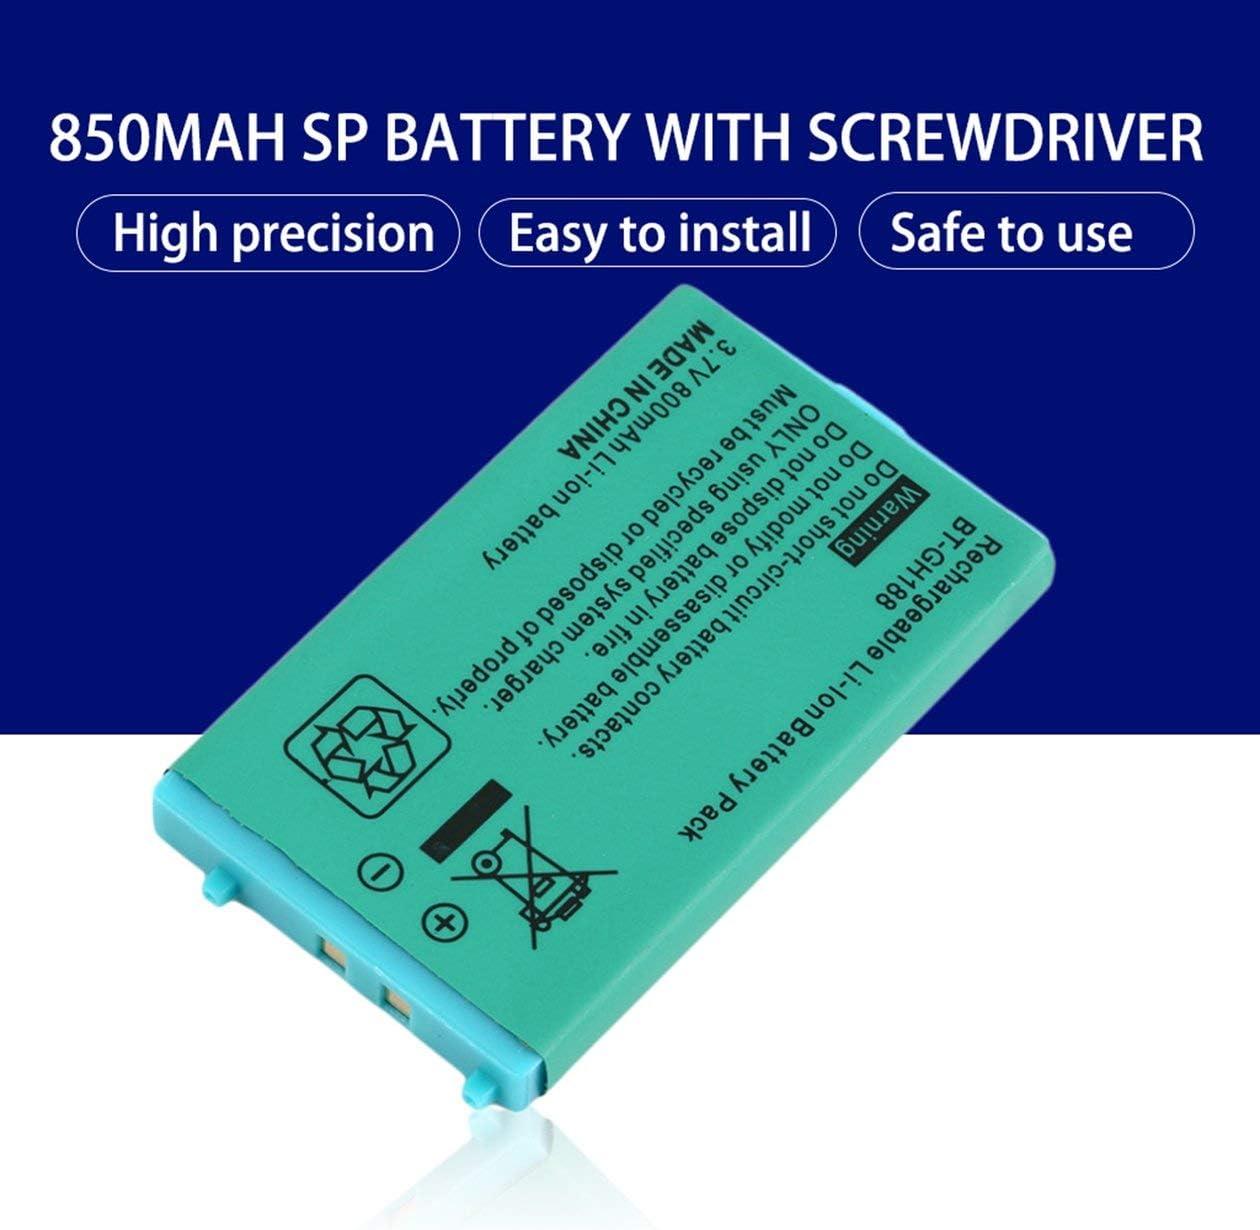 BIYI 3.7V 850 mAh Akku f/ür f/ür Nintend f/ür Game Boy Advance SP Systeme mit Schraubendreher Lithium Batterie Gr/ün